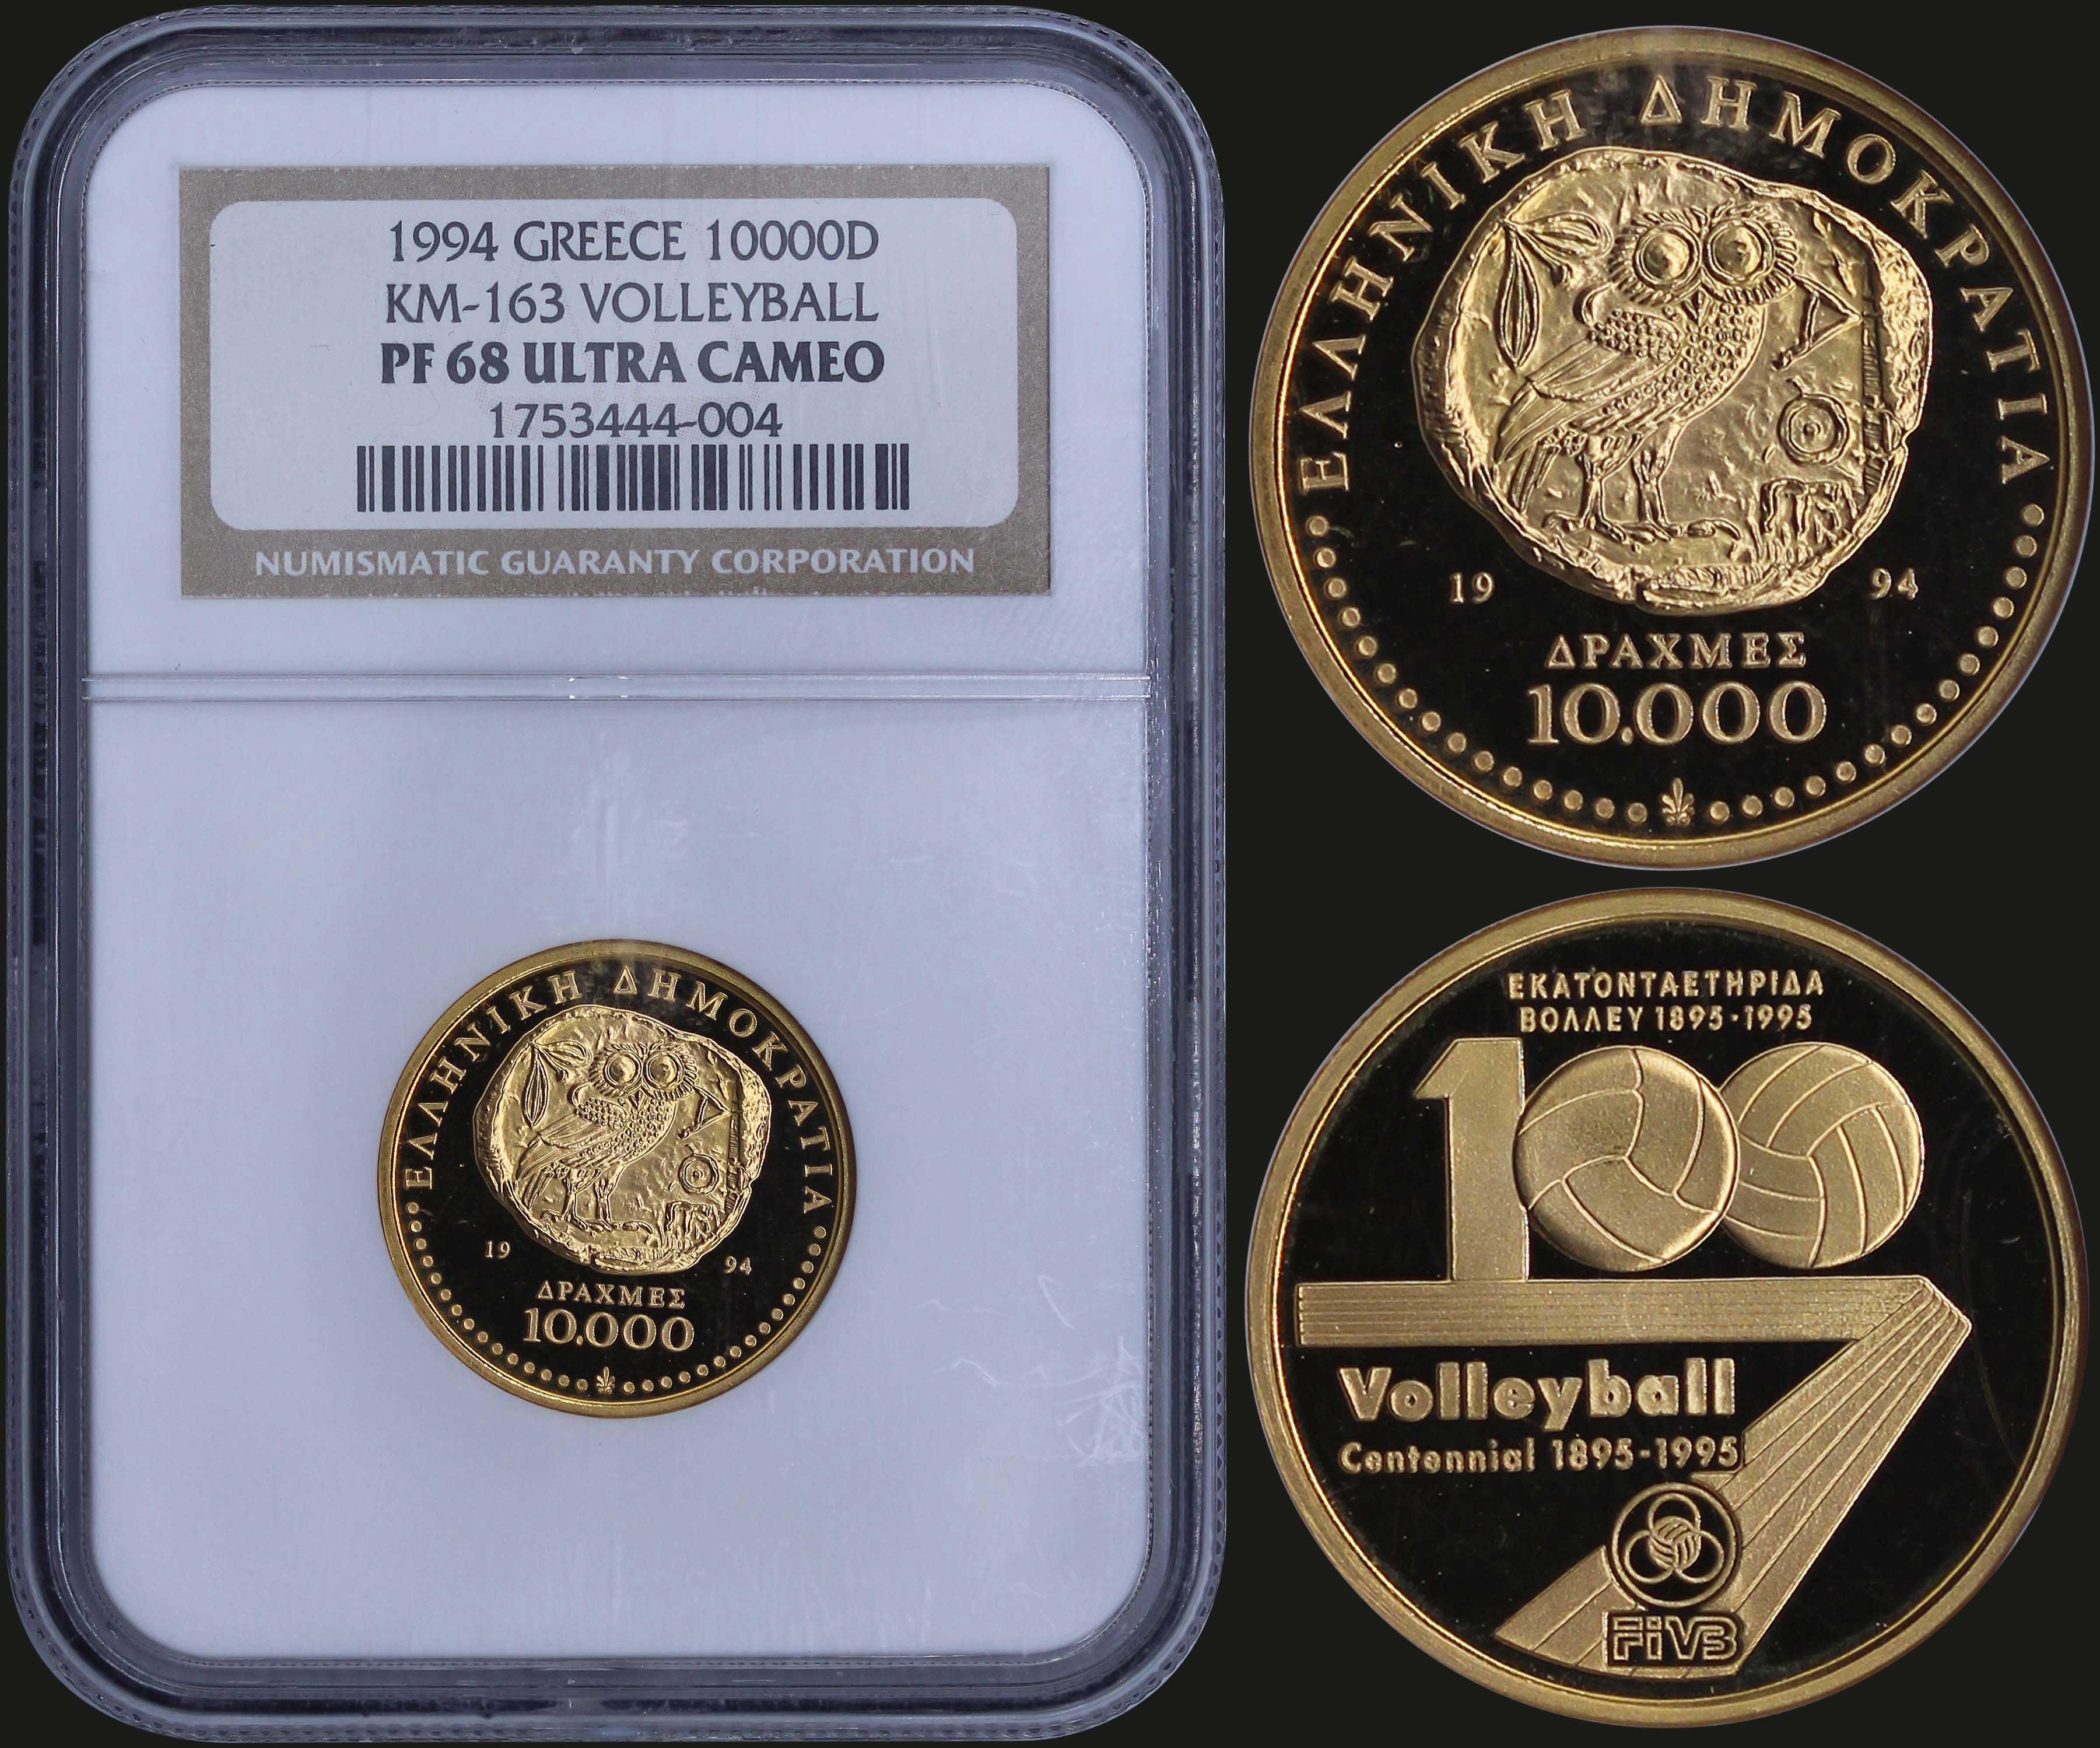 Lot 6232 - -  COINS & TOKENS HELLENIC REPUBLIC & COMMEMORATIVE ISSUES -  A. Karamitsos Public & Live Internet Auction 682 (Part A) Coins, Medals & Banknotes